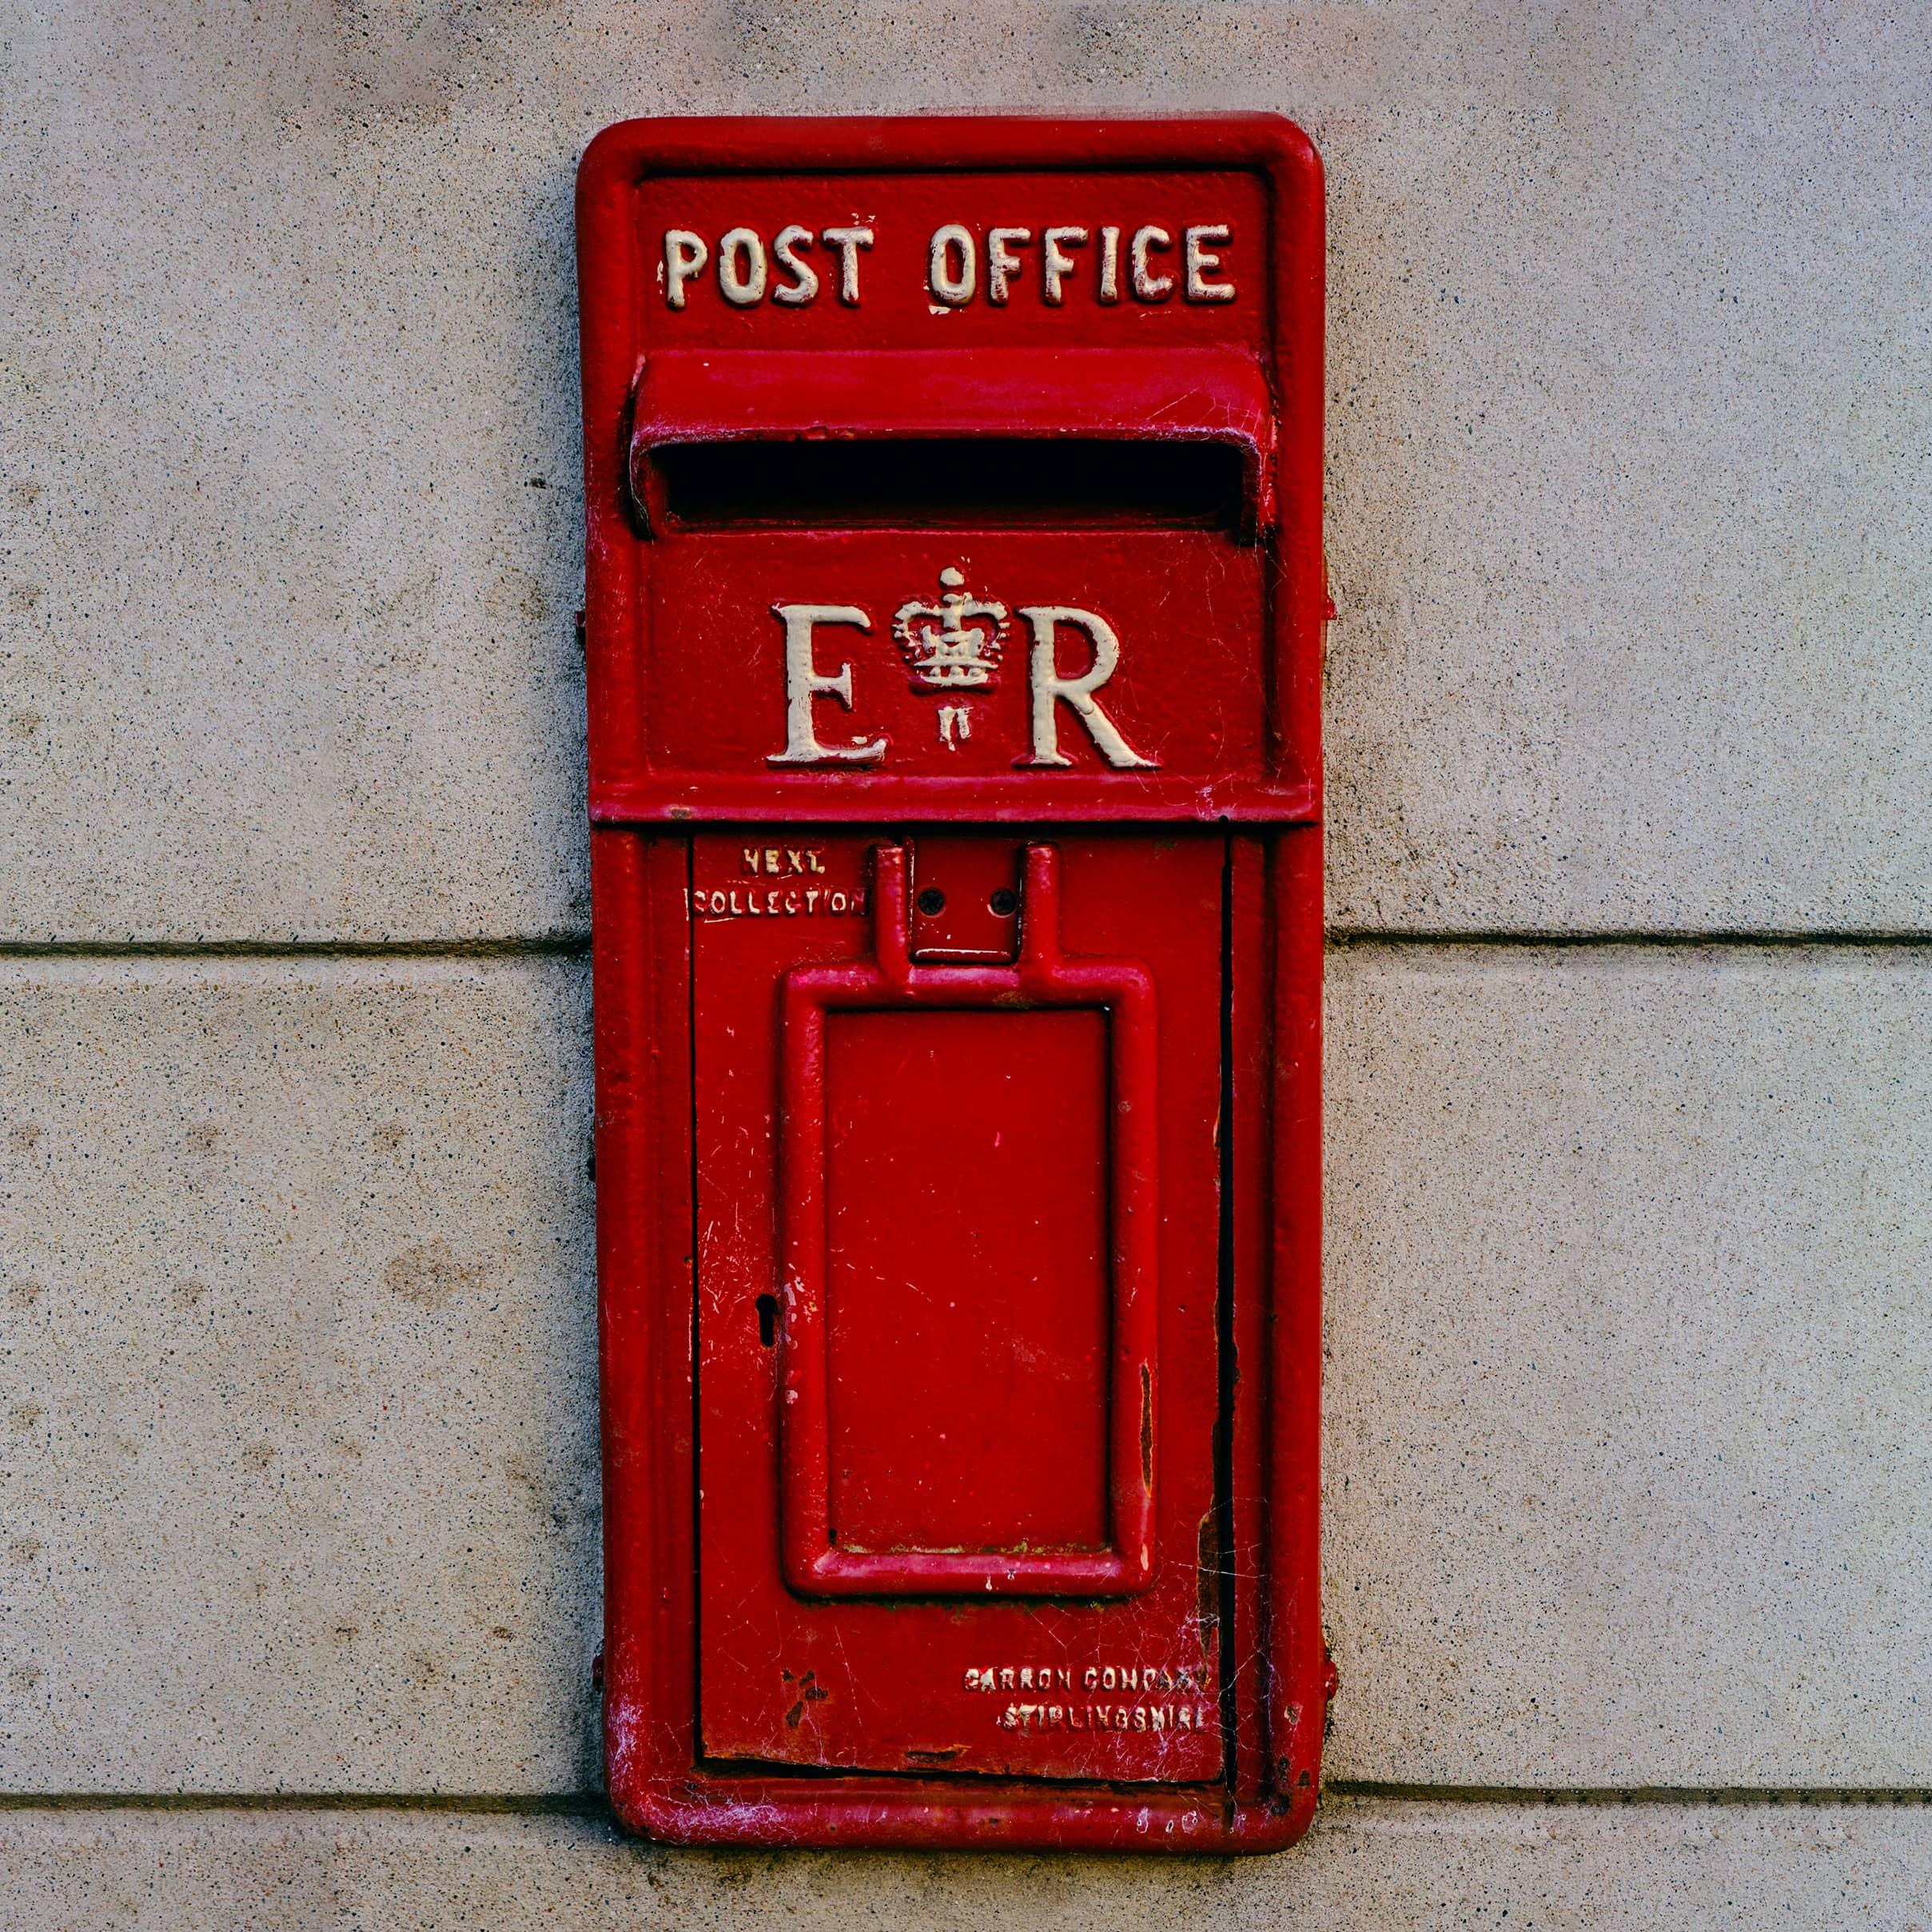 postbox-challenge-sq-3-1160x665